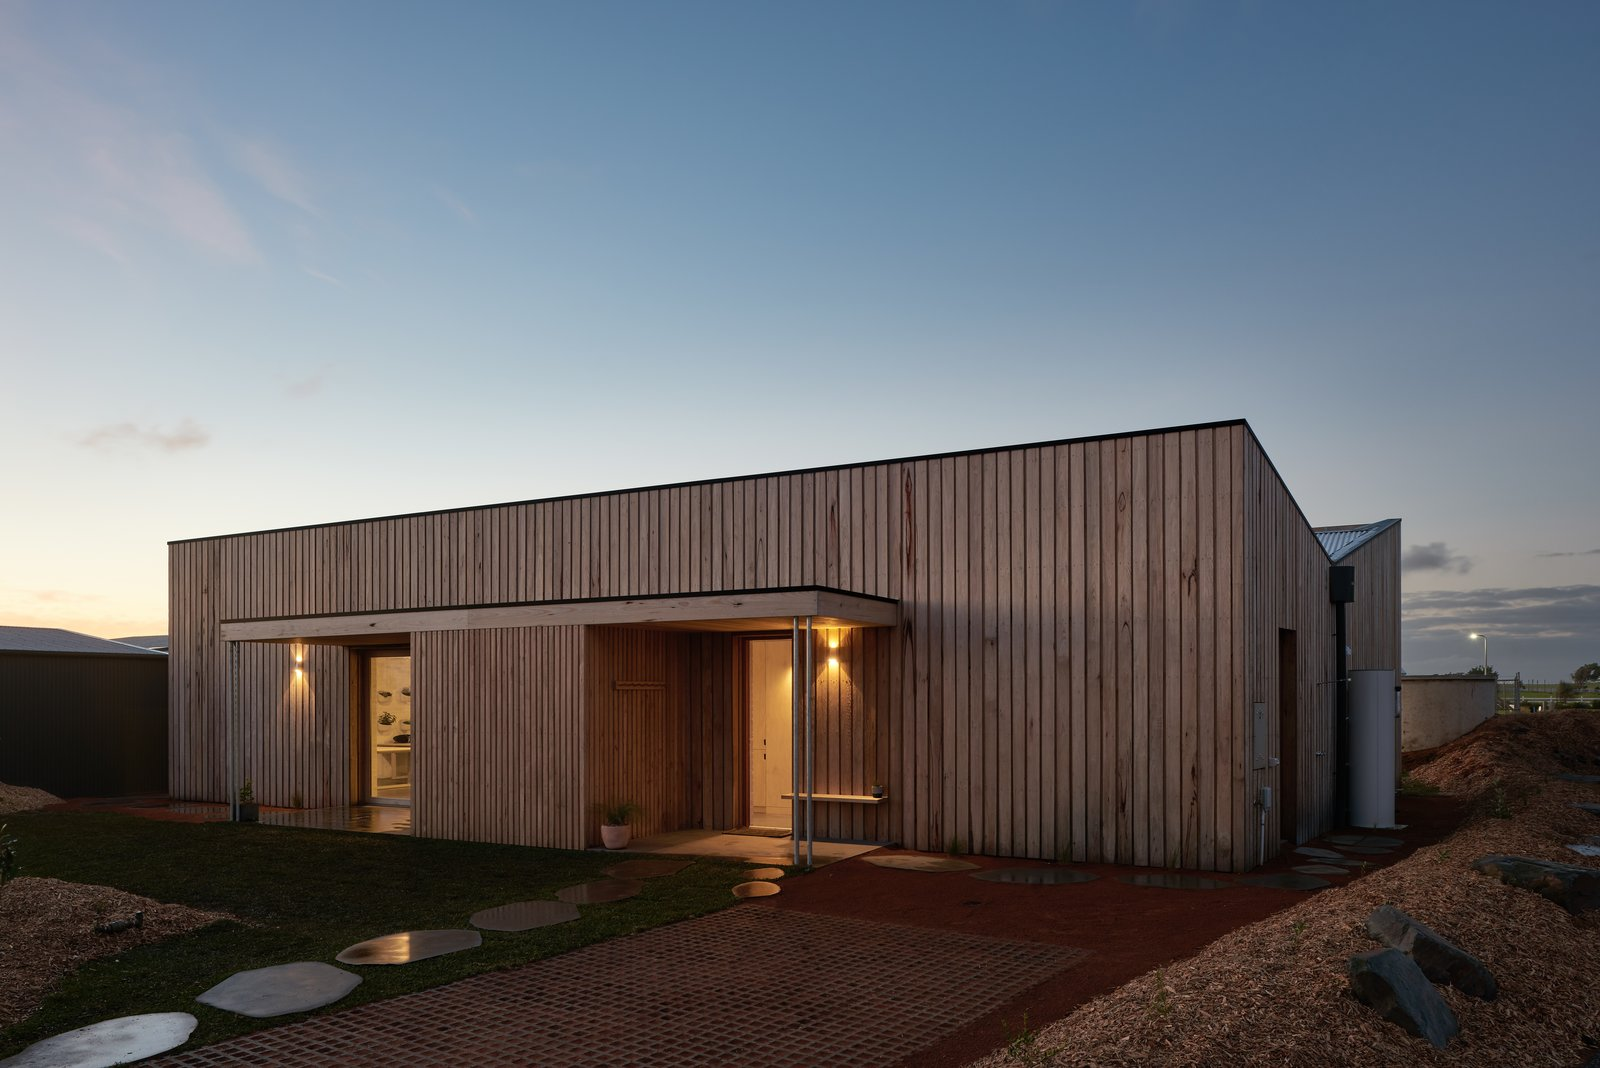 The 10-Star Home exterior